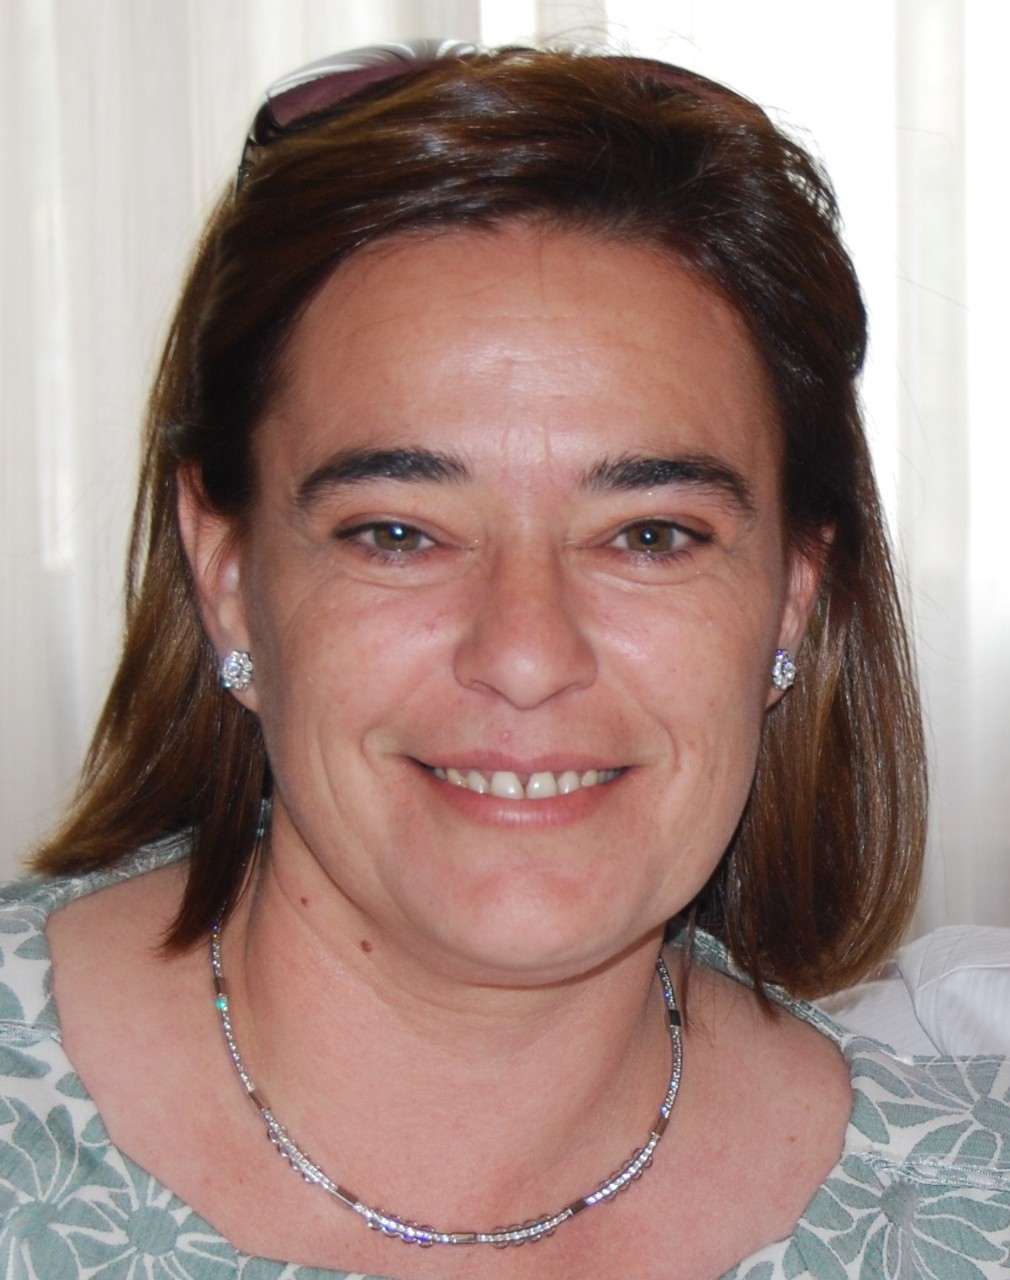 Lola Sánchez Murcia